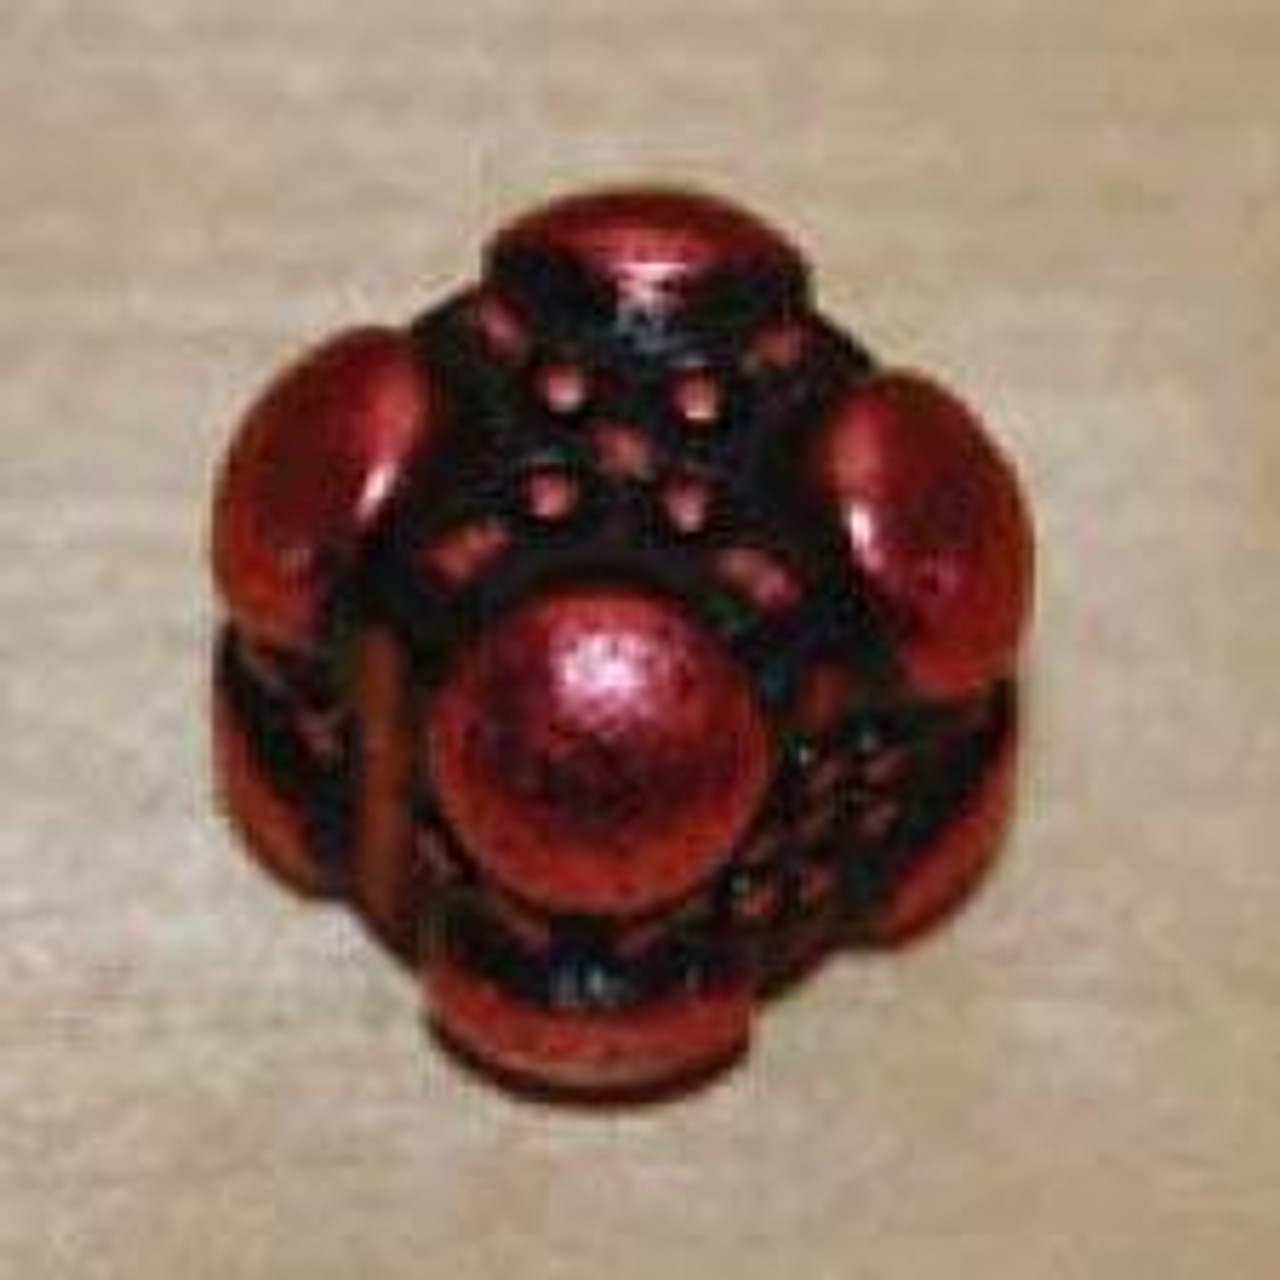 IronDie Red Powerup Common Single Die #63